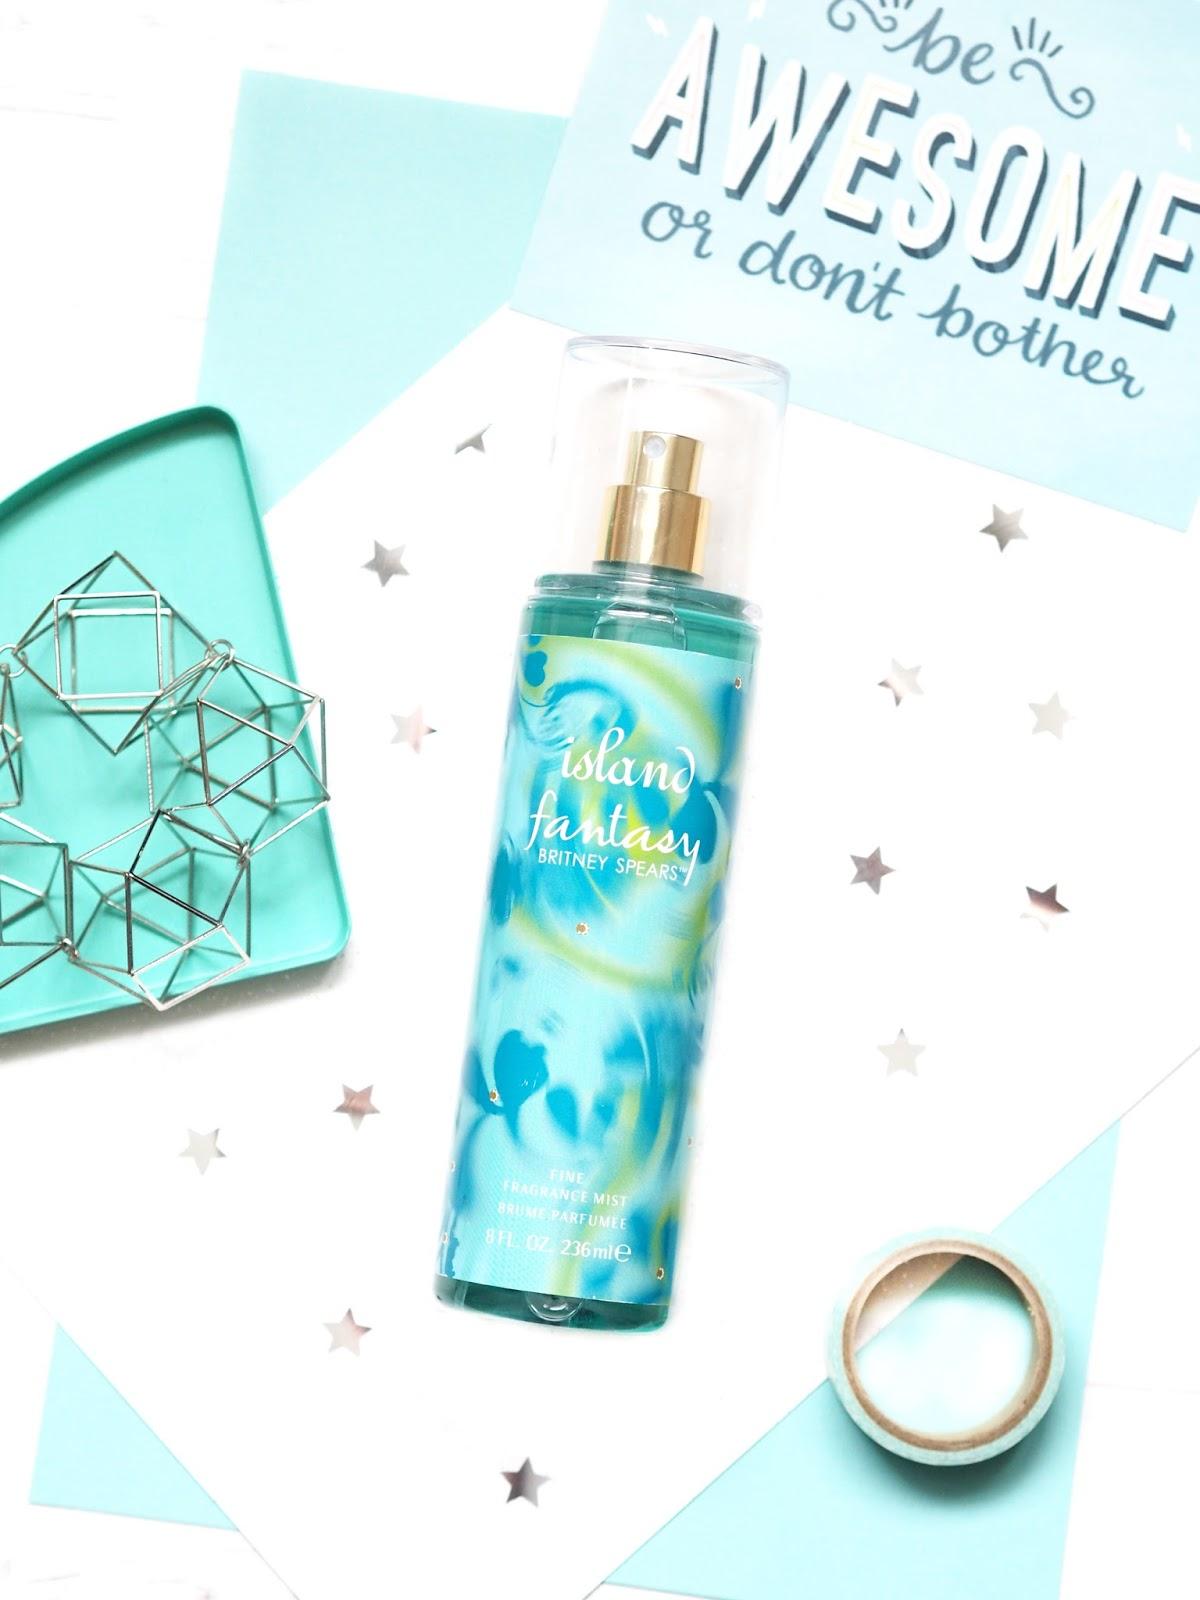 Britney Spears Island Fantasy Fragrance Mist Review